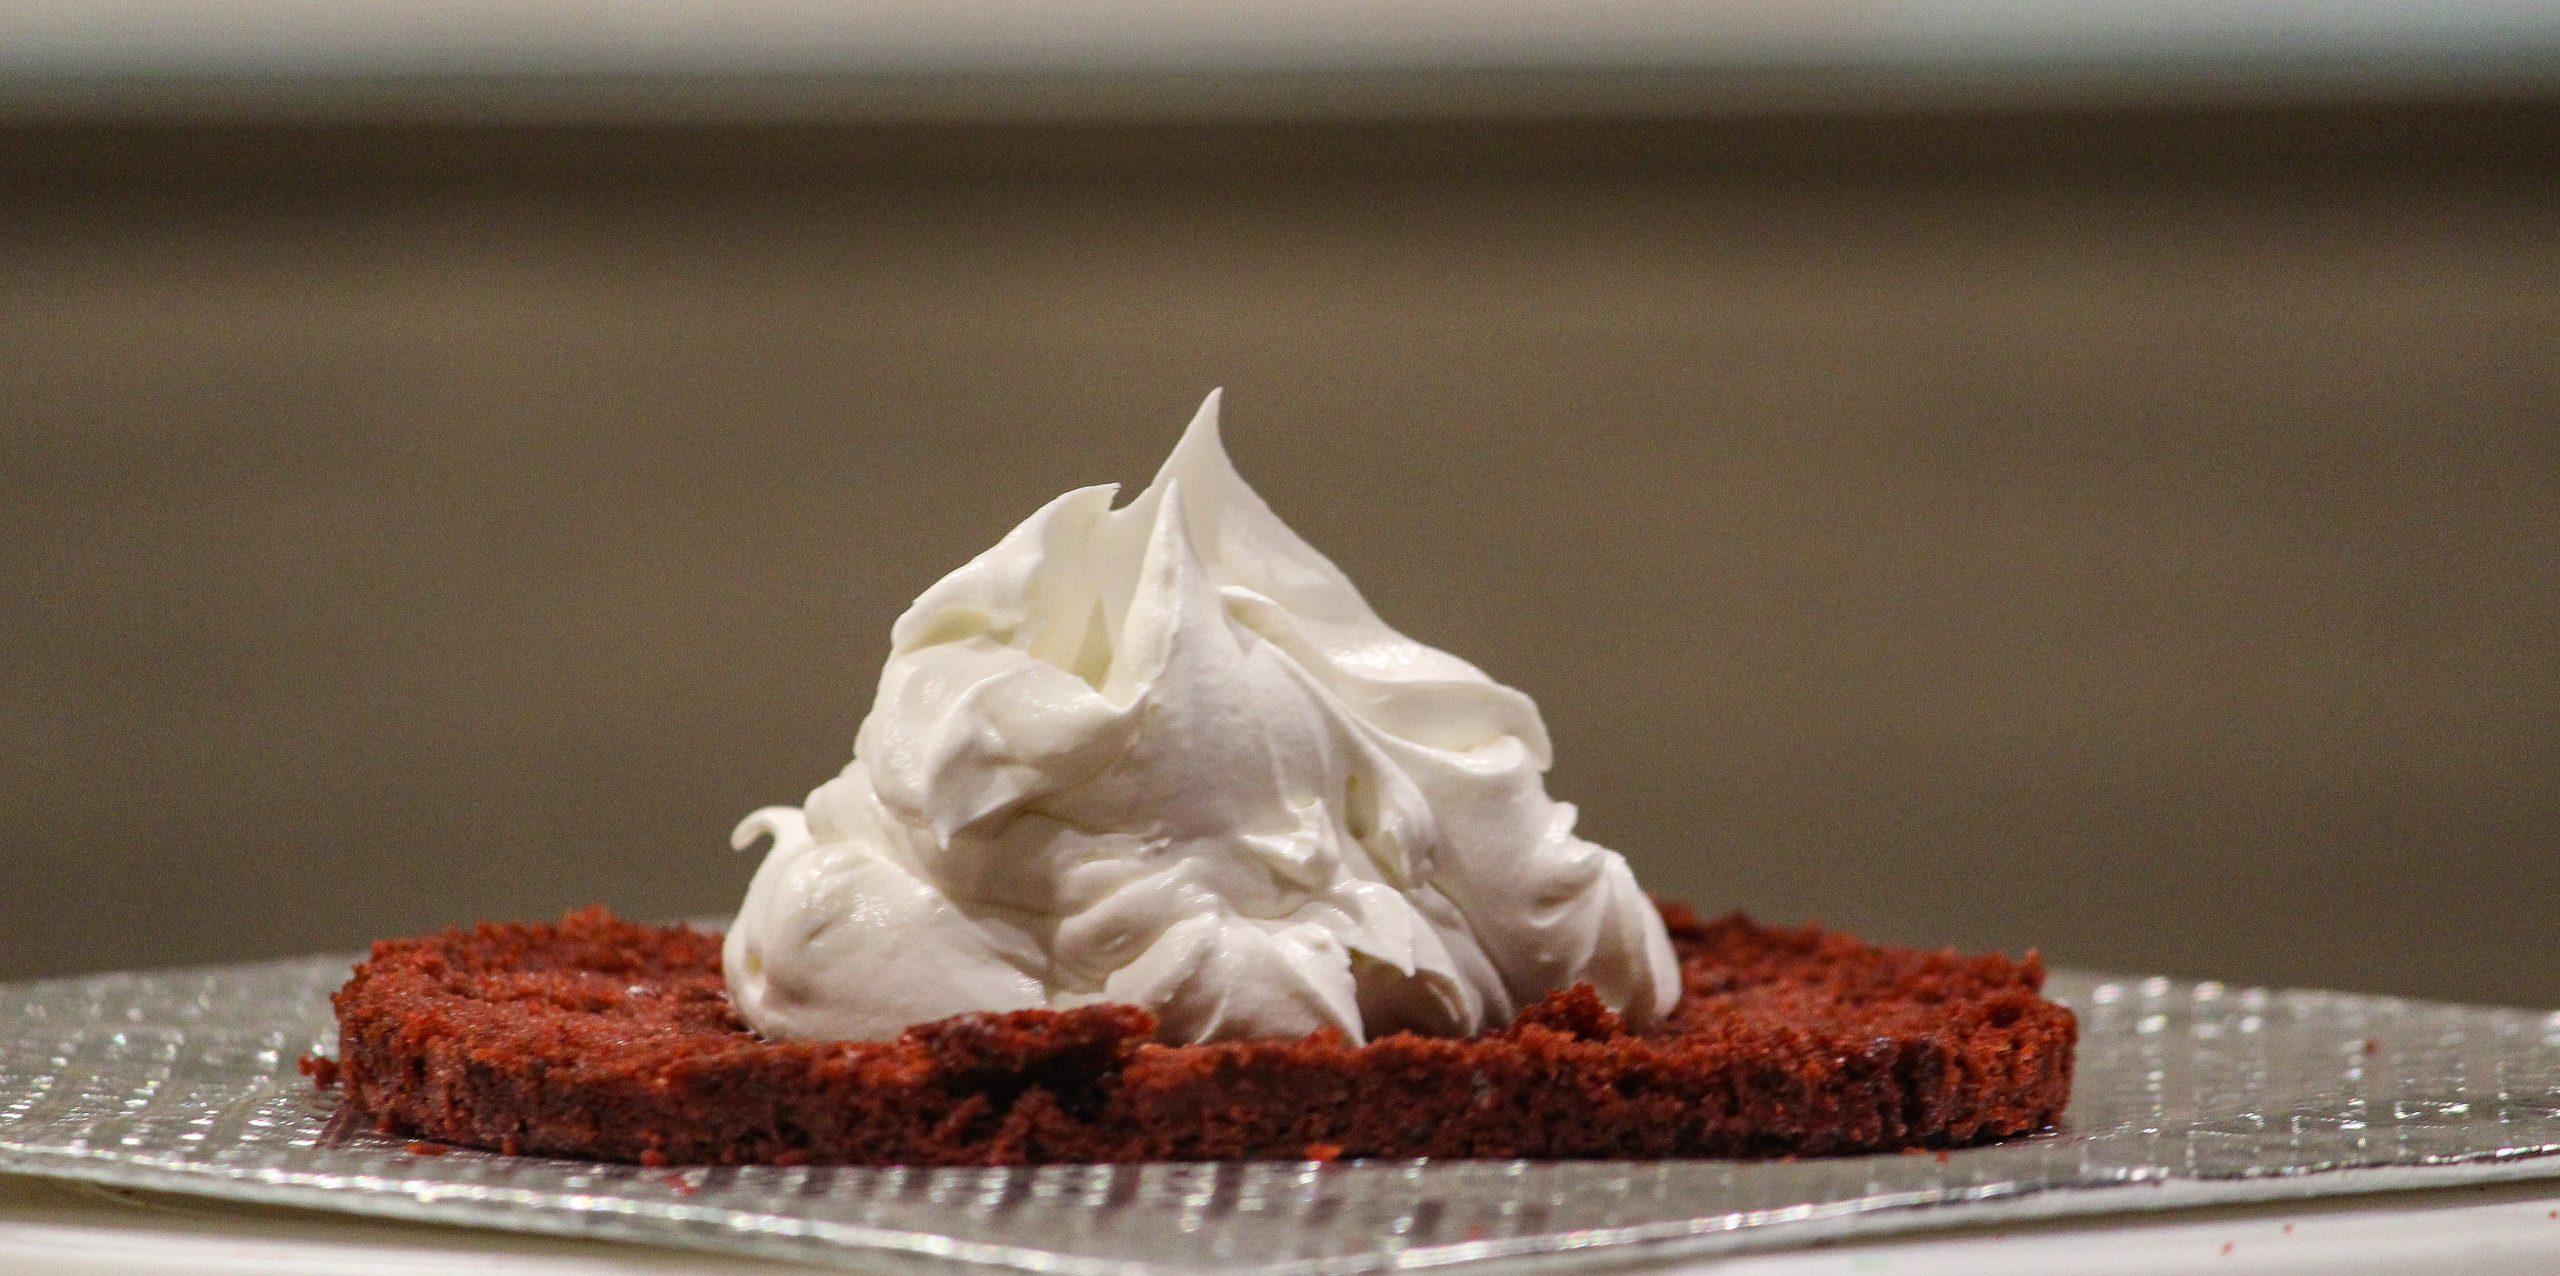 Red Velvet Cake base with vanilla cream on top